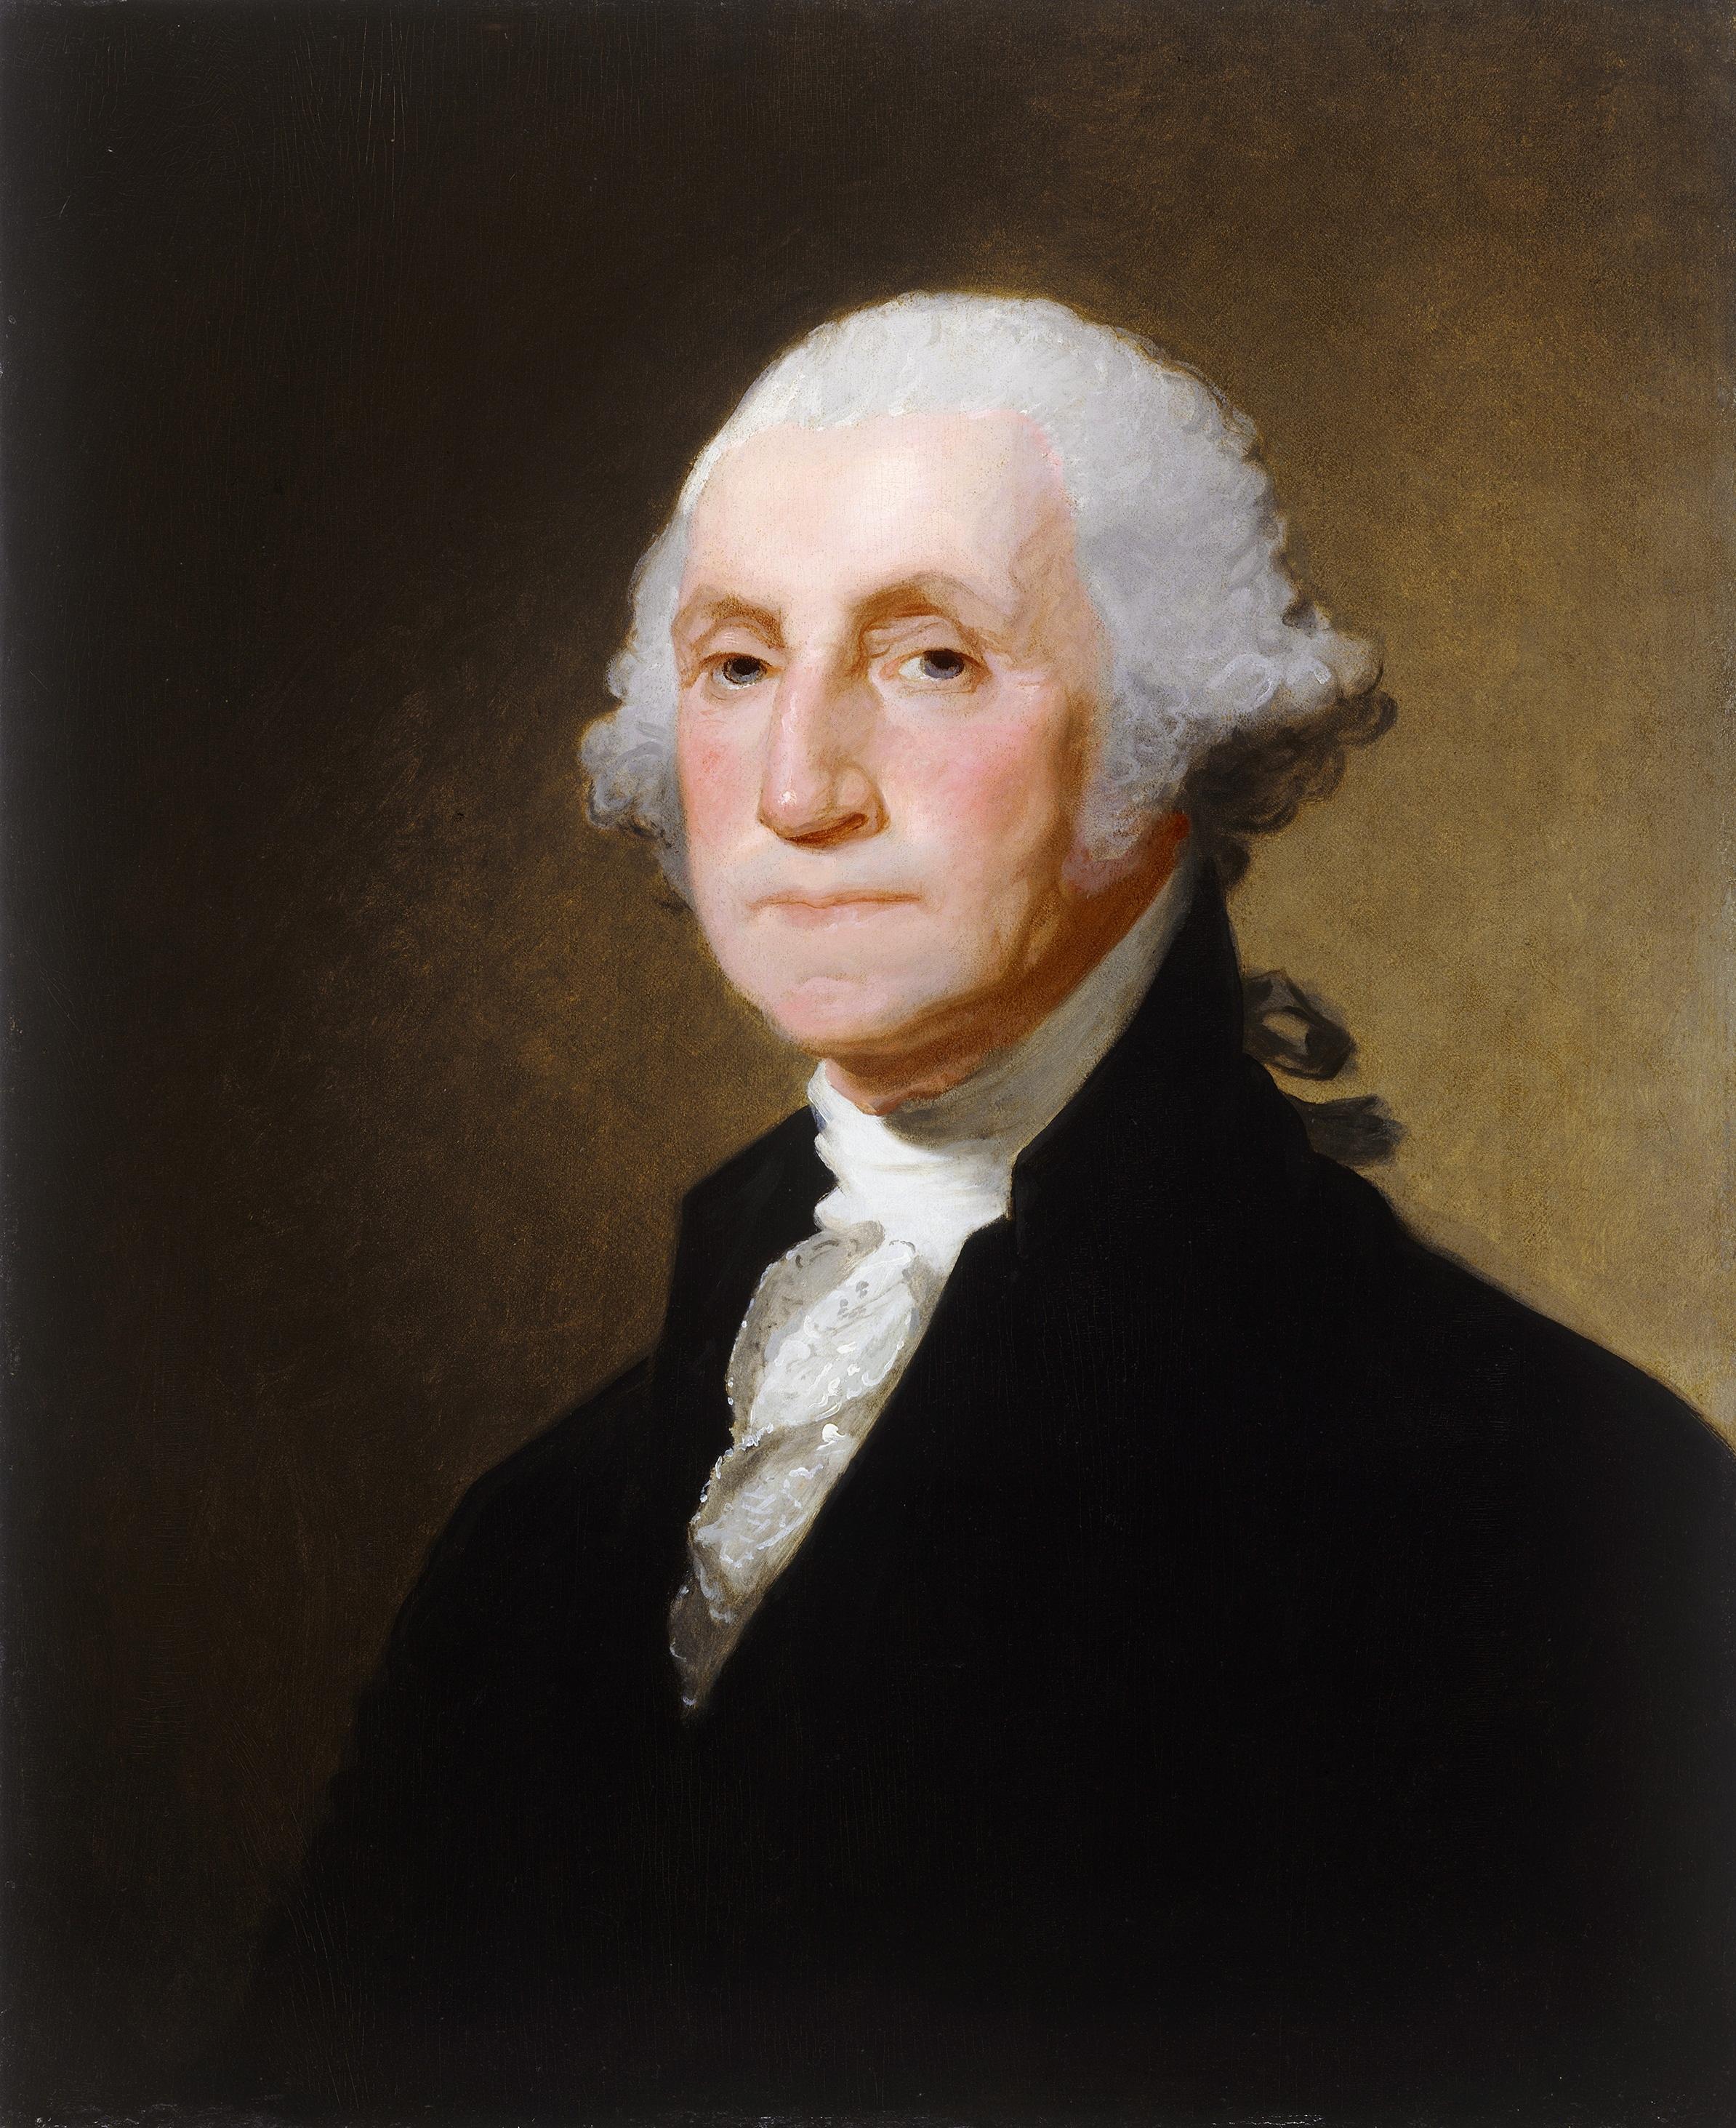 File:George Washington - by Gilbert Stuart - c. 1821 ... George Washington